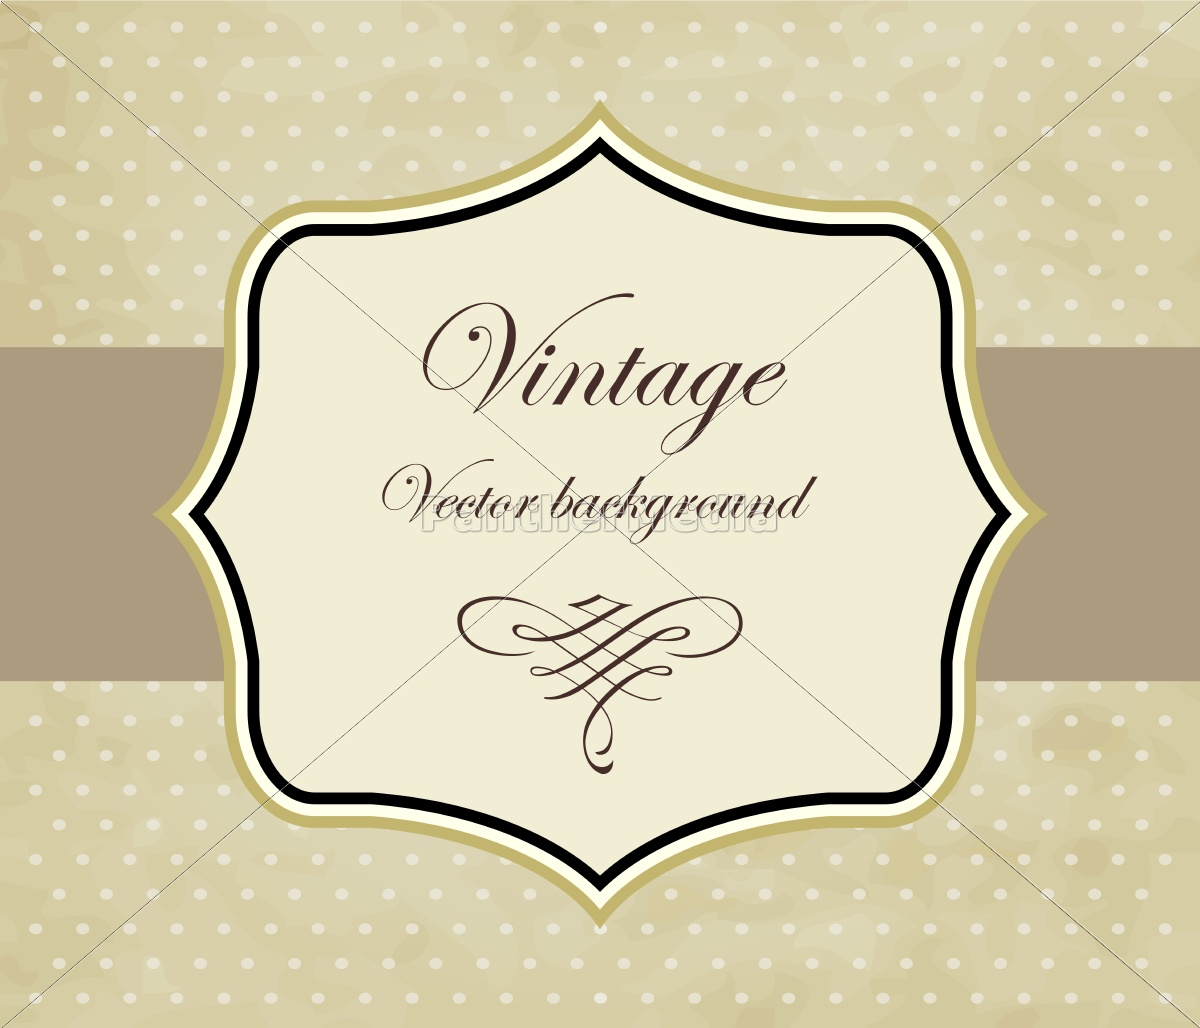 vintage-rahmen vektor-hintergrund - Stockfoto - #12316530 ...